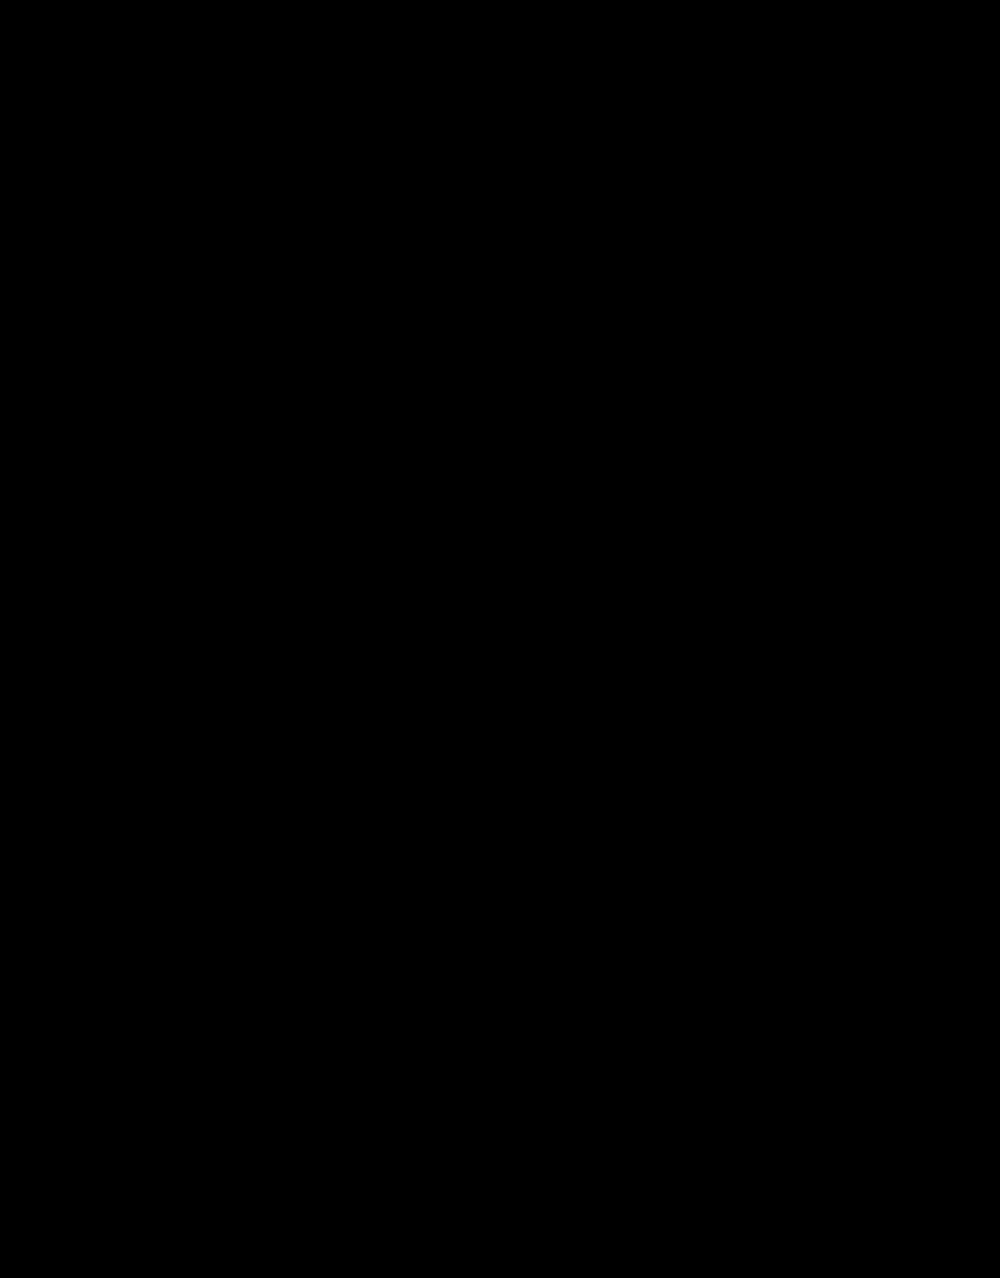 skater-logo-black.png